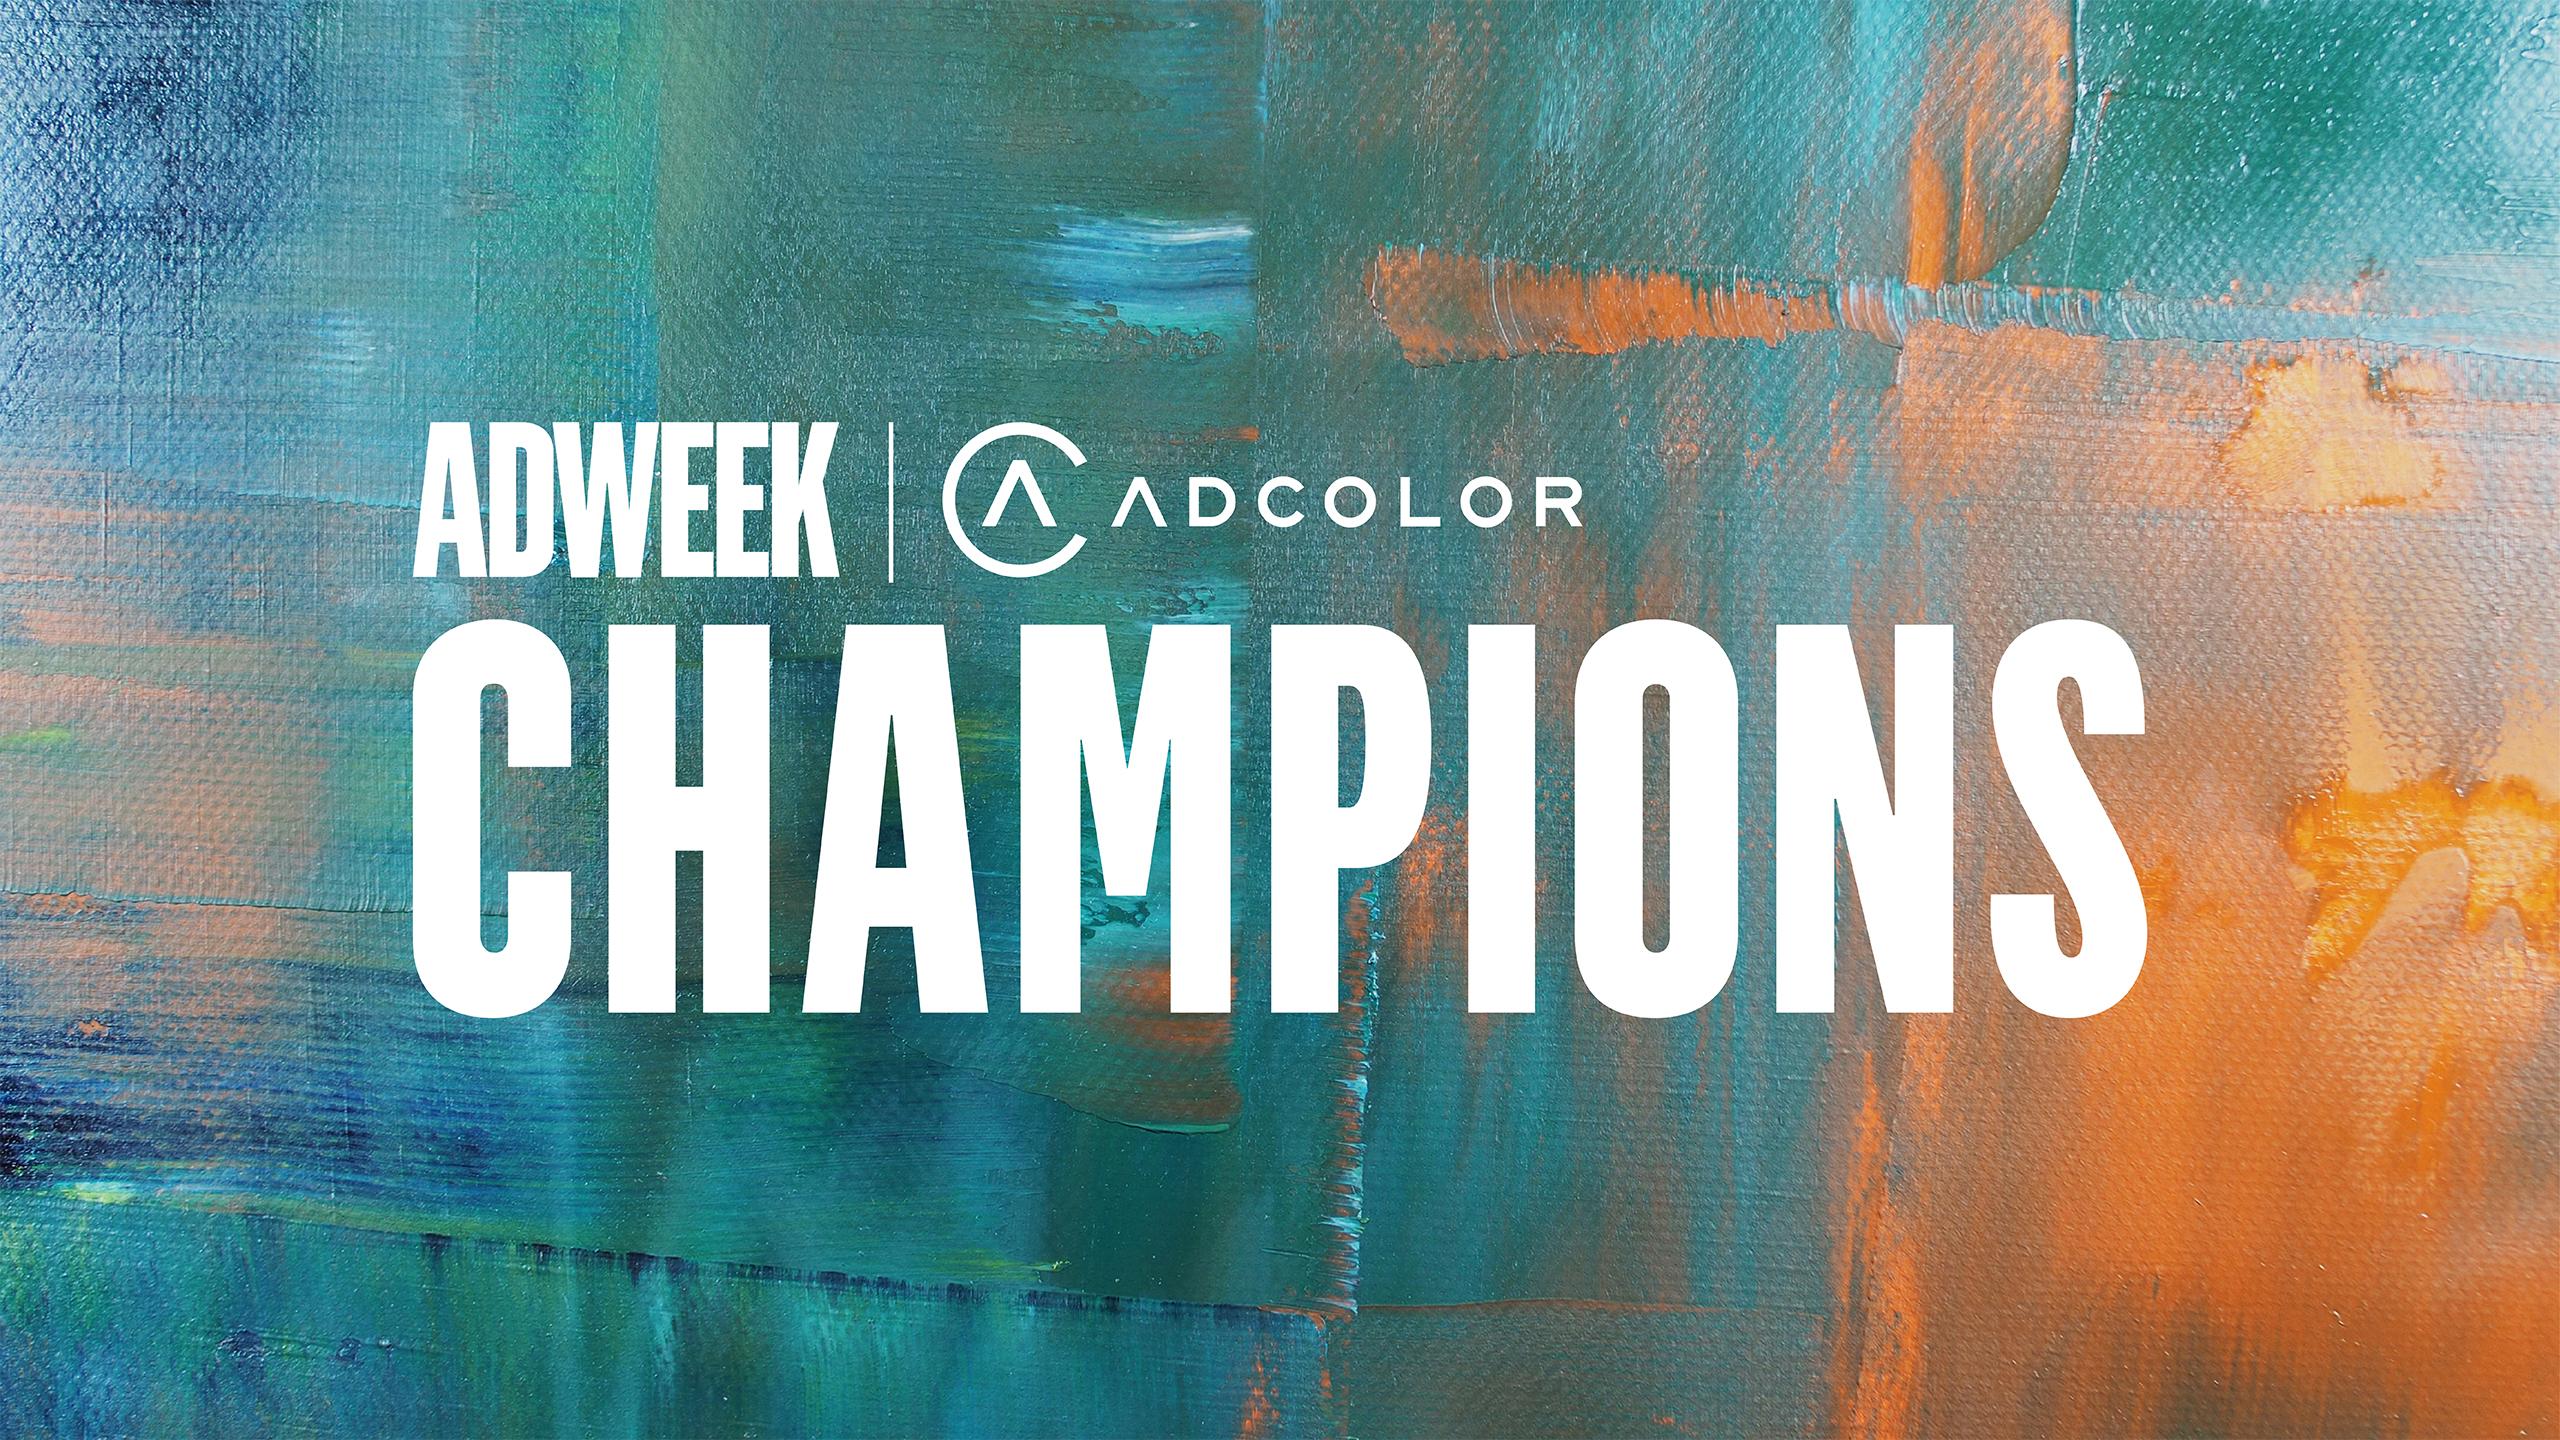 ADWEEK CHAMPIONS